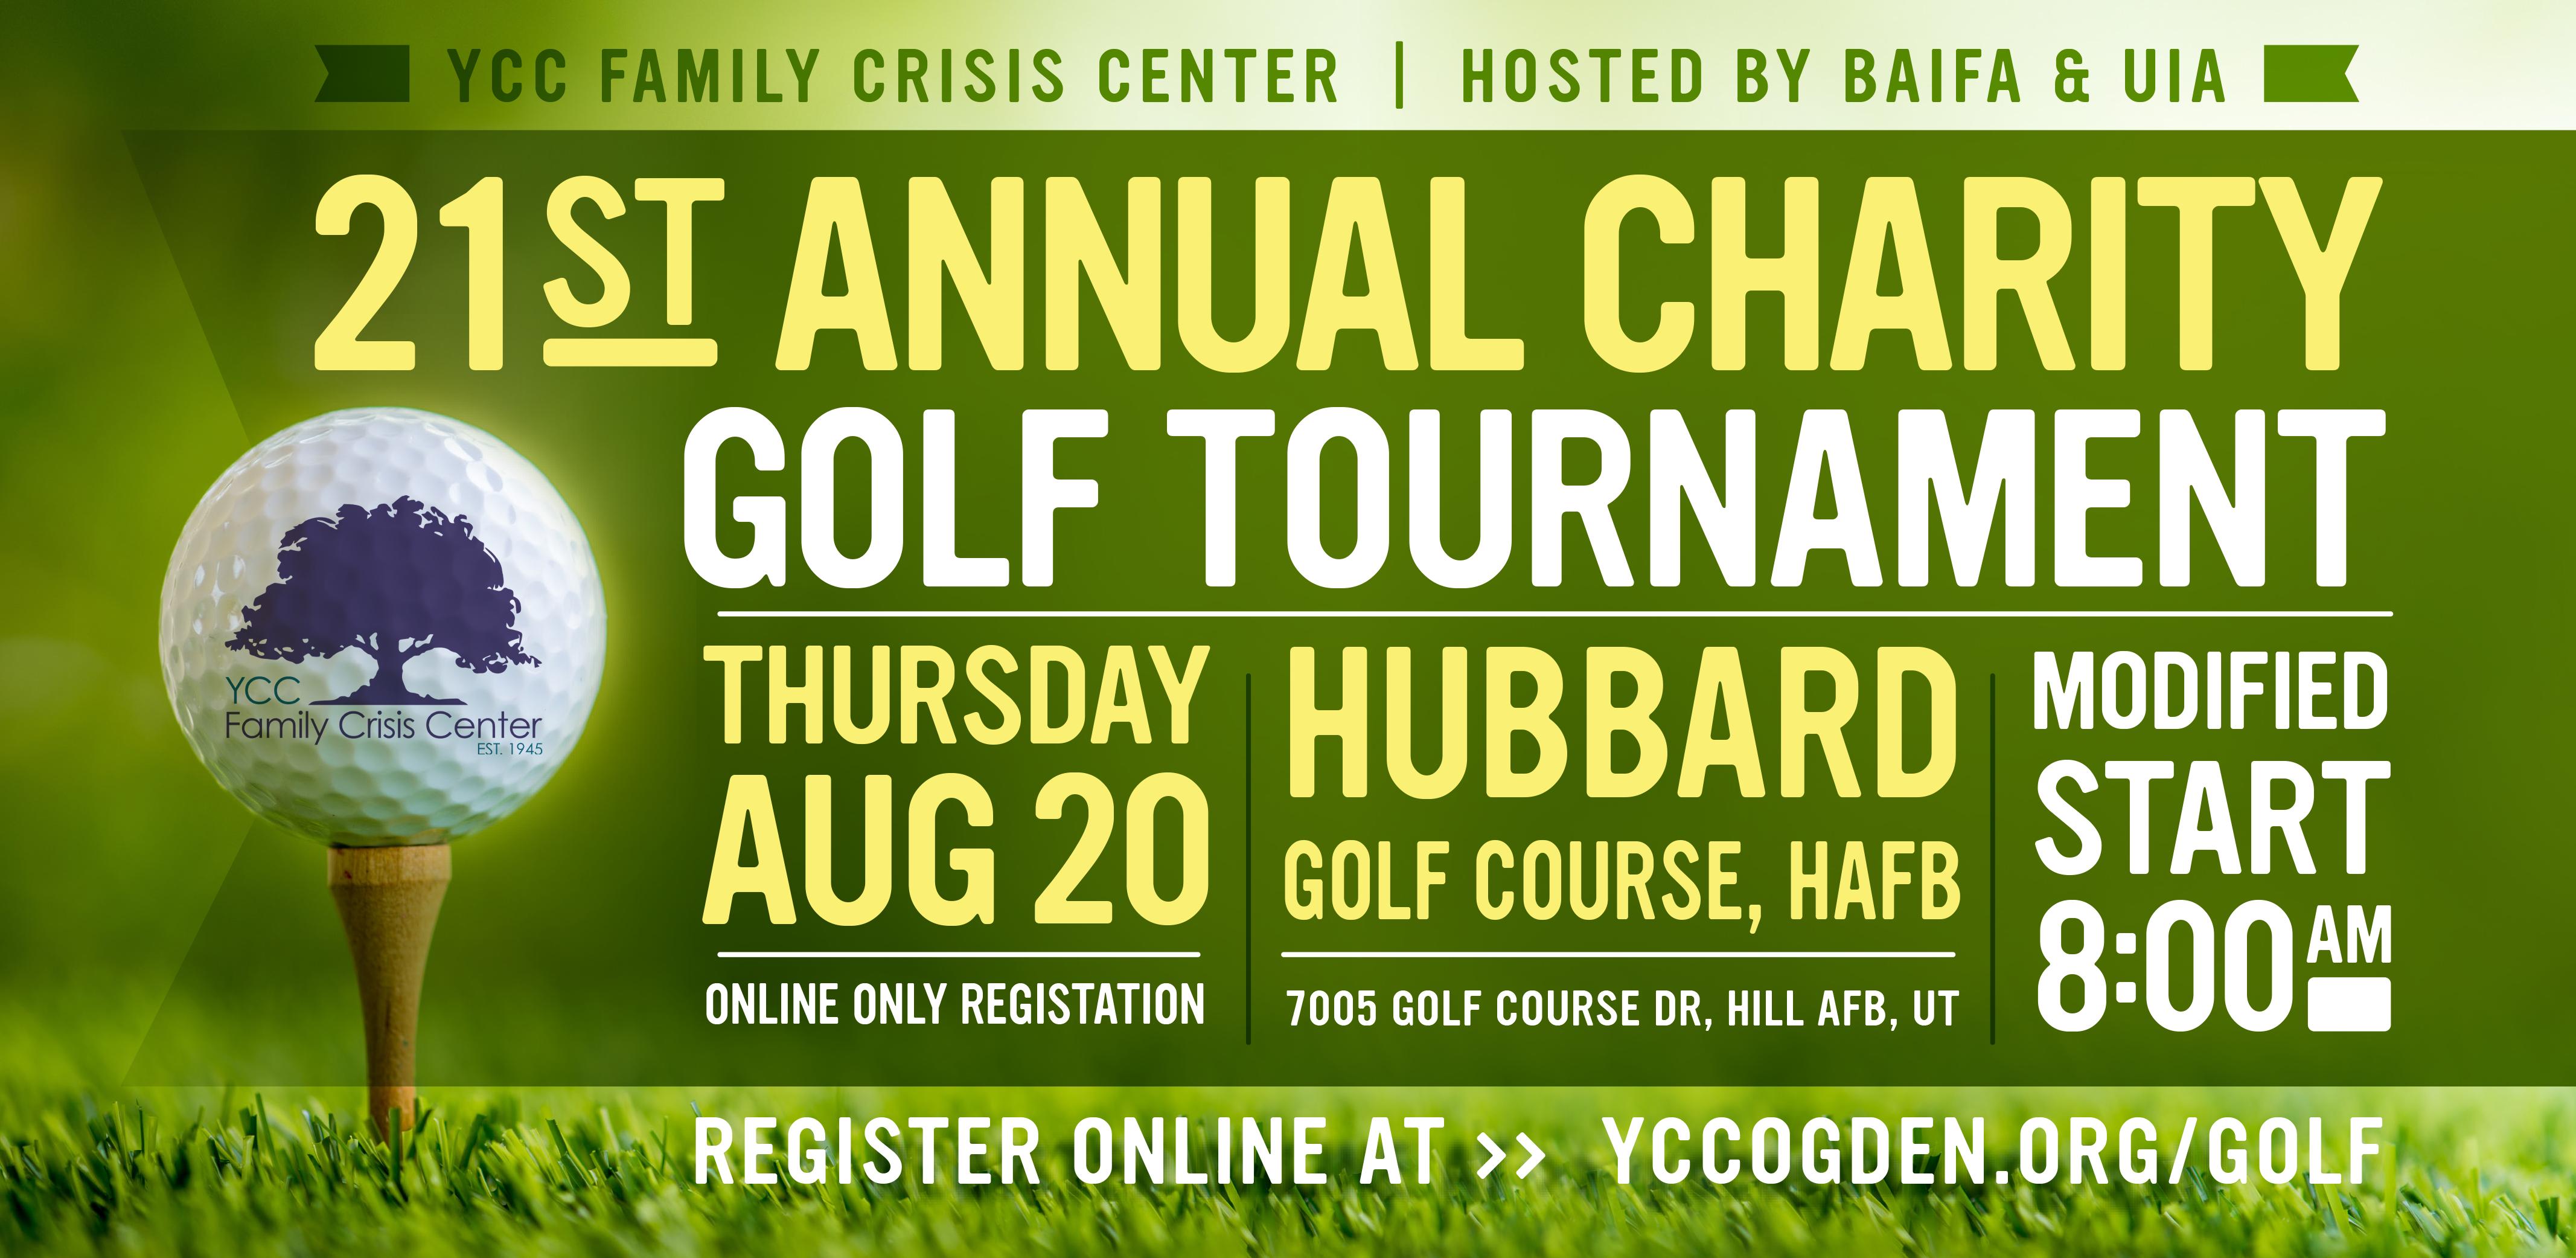 YCC Family Crisis Center 21st Annual Charity Golf Tournament hosted by BAIFA & UIA